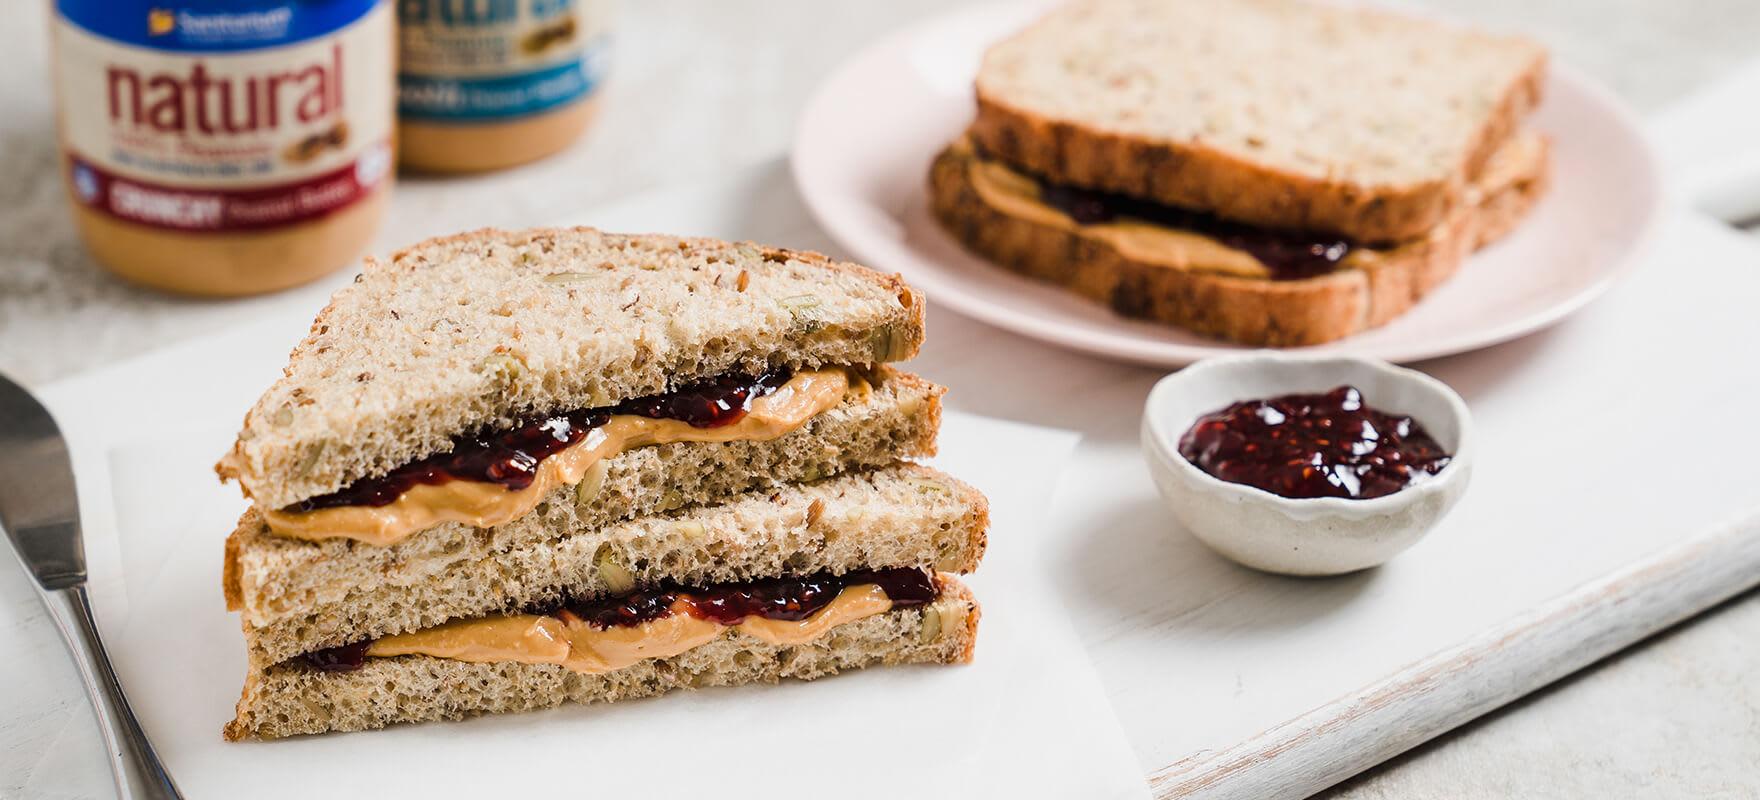 Peanut butter & jam sandwich image 1